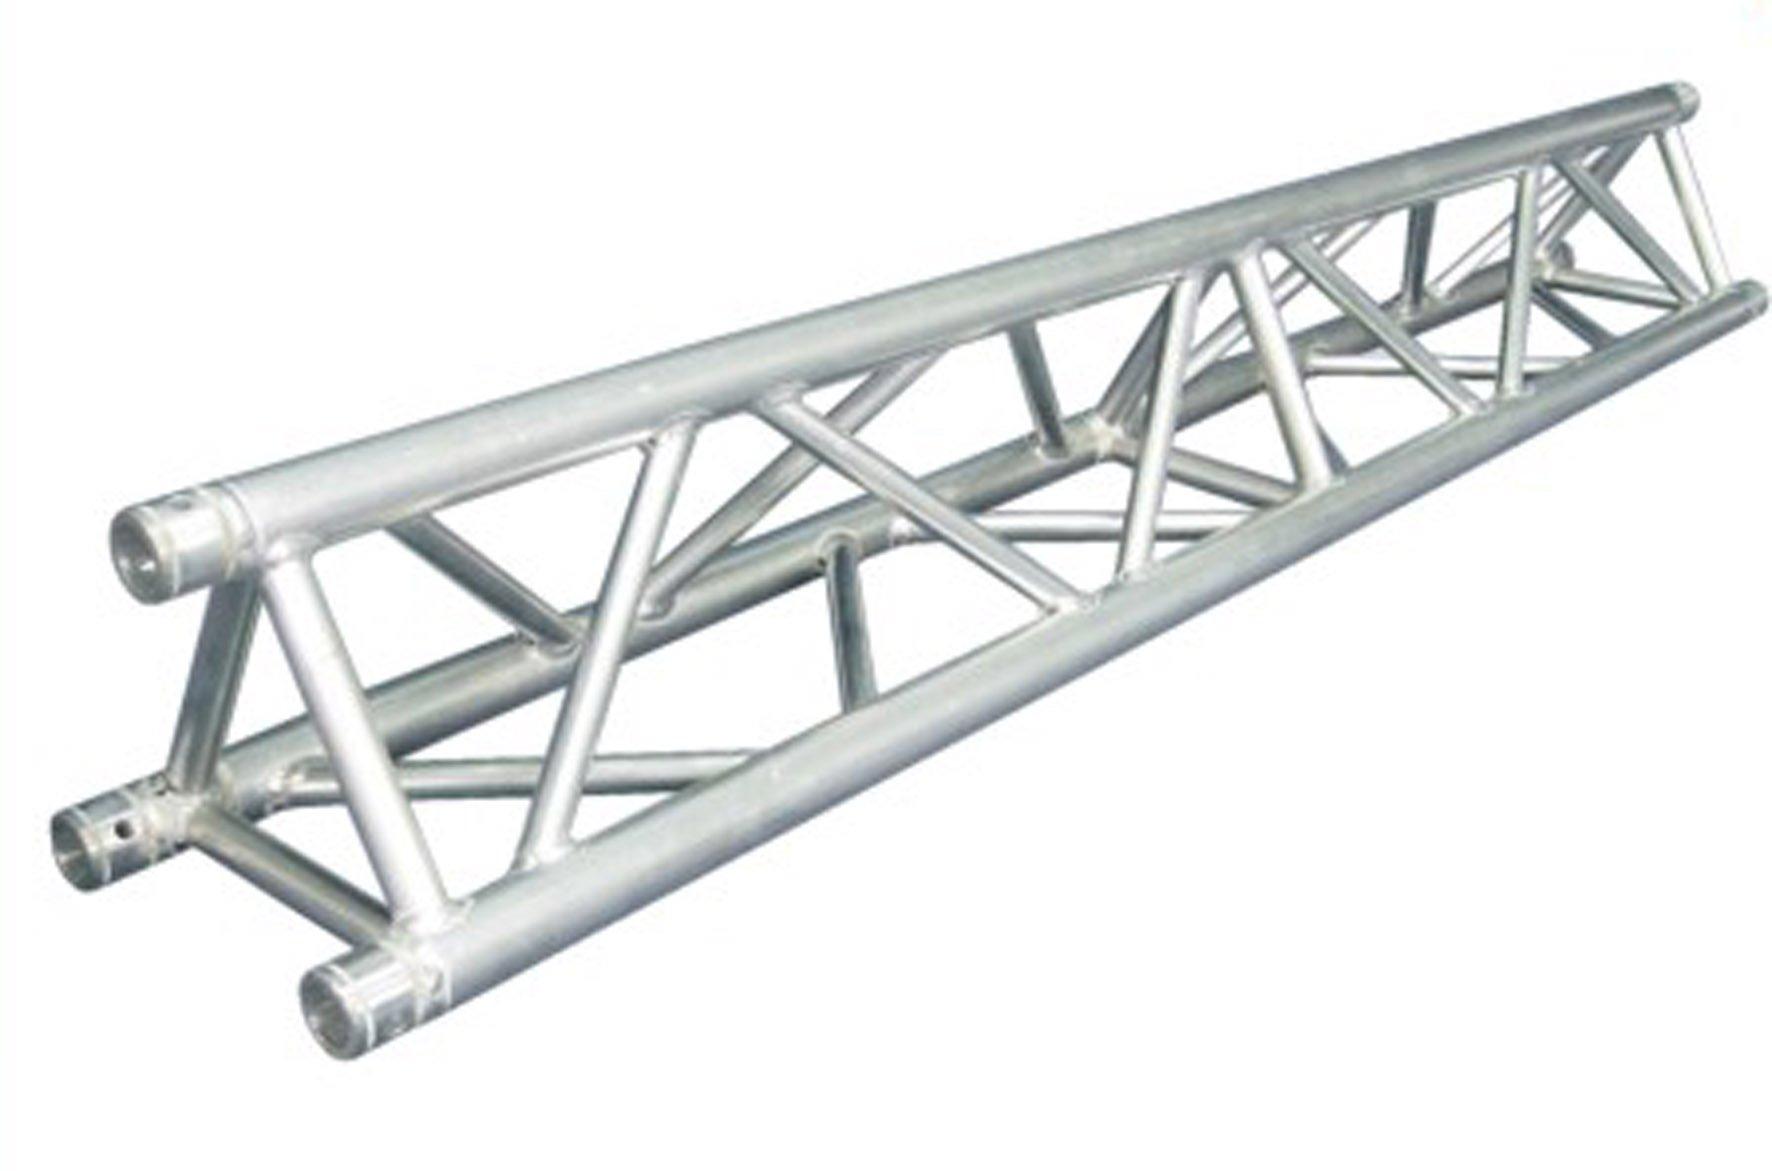 Aluminium Triangle Ladder Lighting Truss System Flat Truss